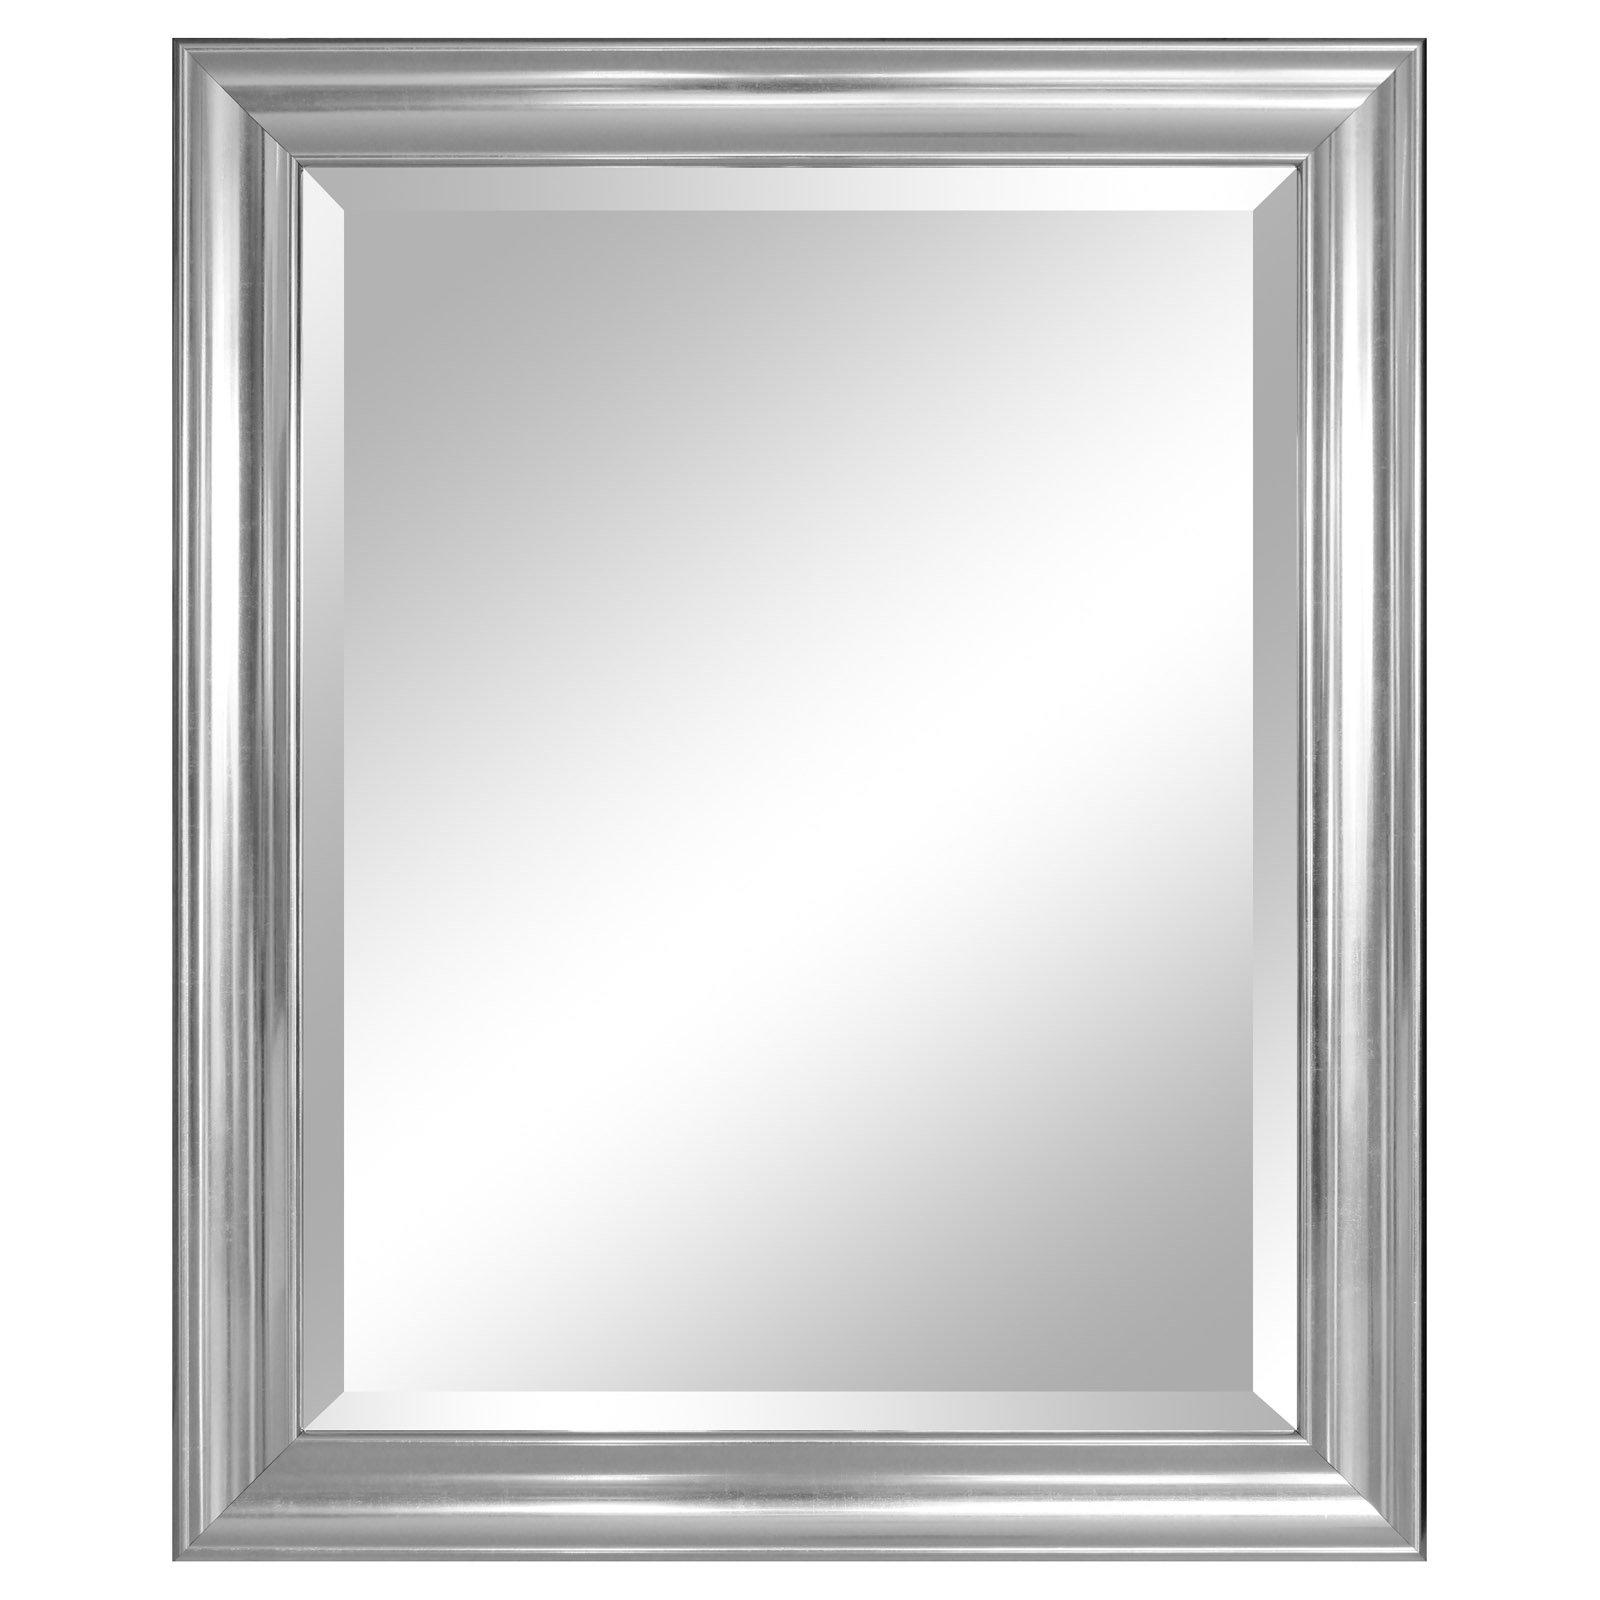 Bathroom wall mirrors Gold Alpine Furniture Crackled Silver Wall Mirror Walmart Bathroom Wall Mirrors